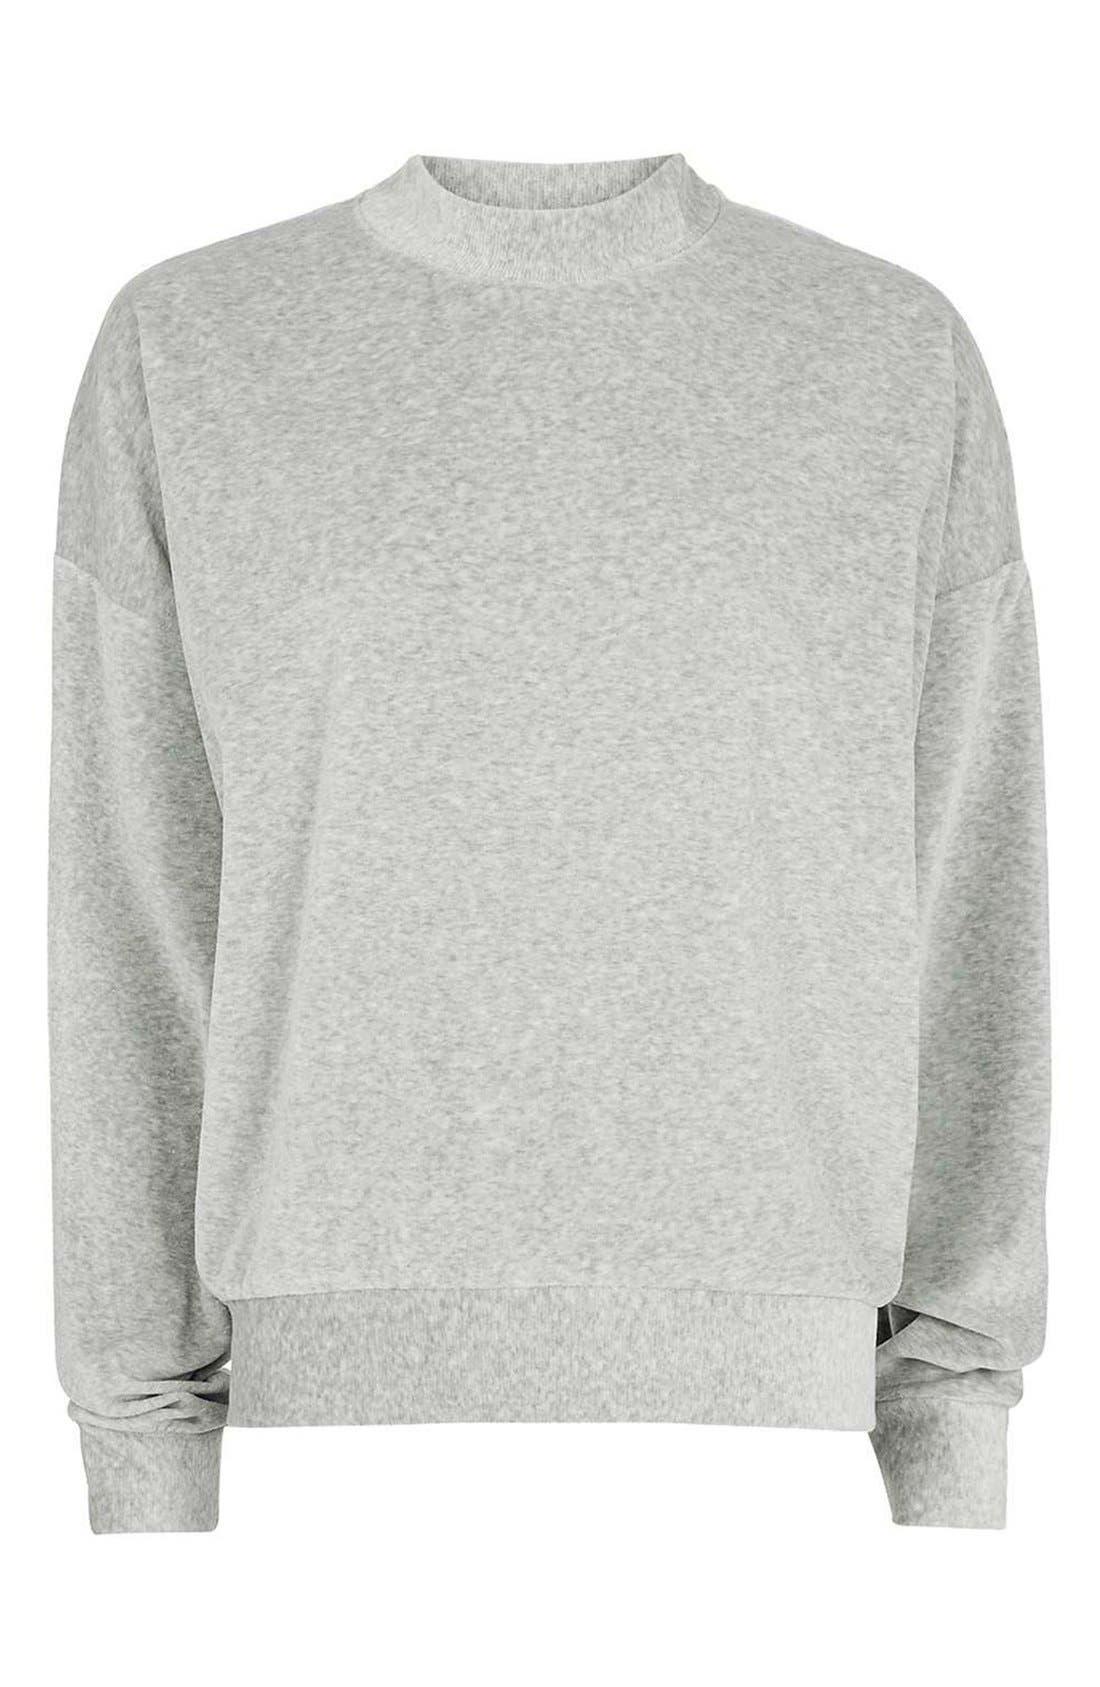 TOPSHOP,                             Batwing Velvet Sweater,                             Alternate thumbnail 5, color,                             020